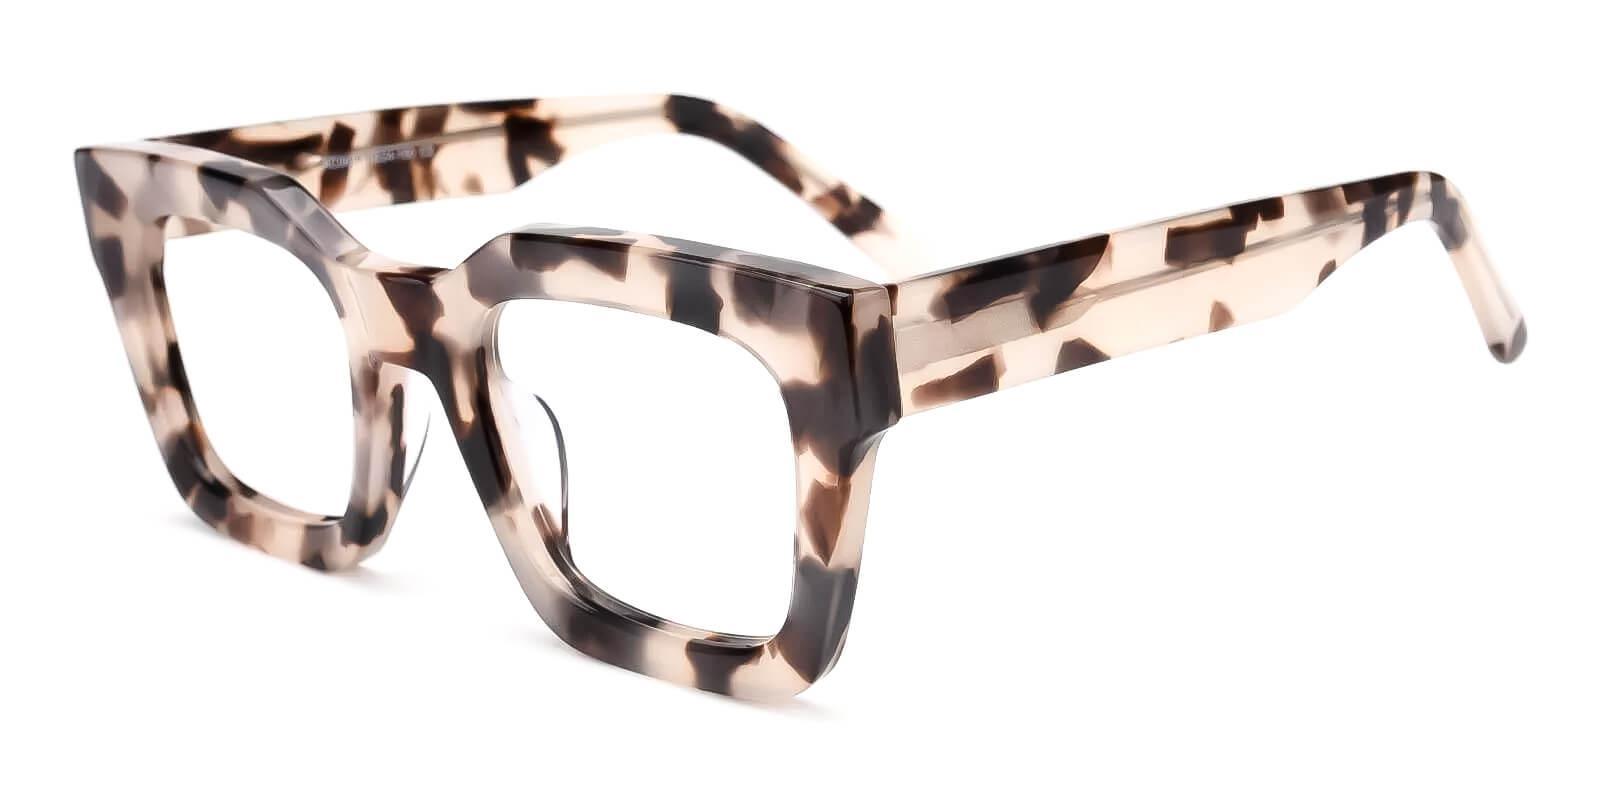 Cloud Leopard Acetate Eyeglasses , Fashion , UniversalBridgeFit Frames from ABBE Glasses